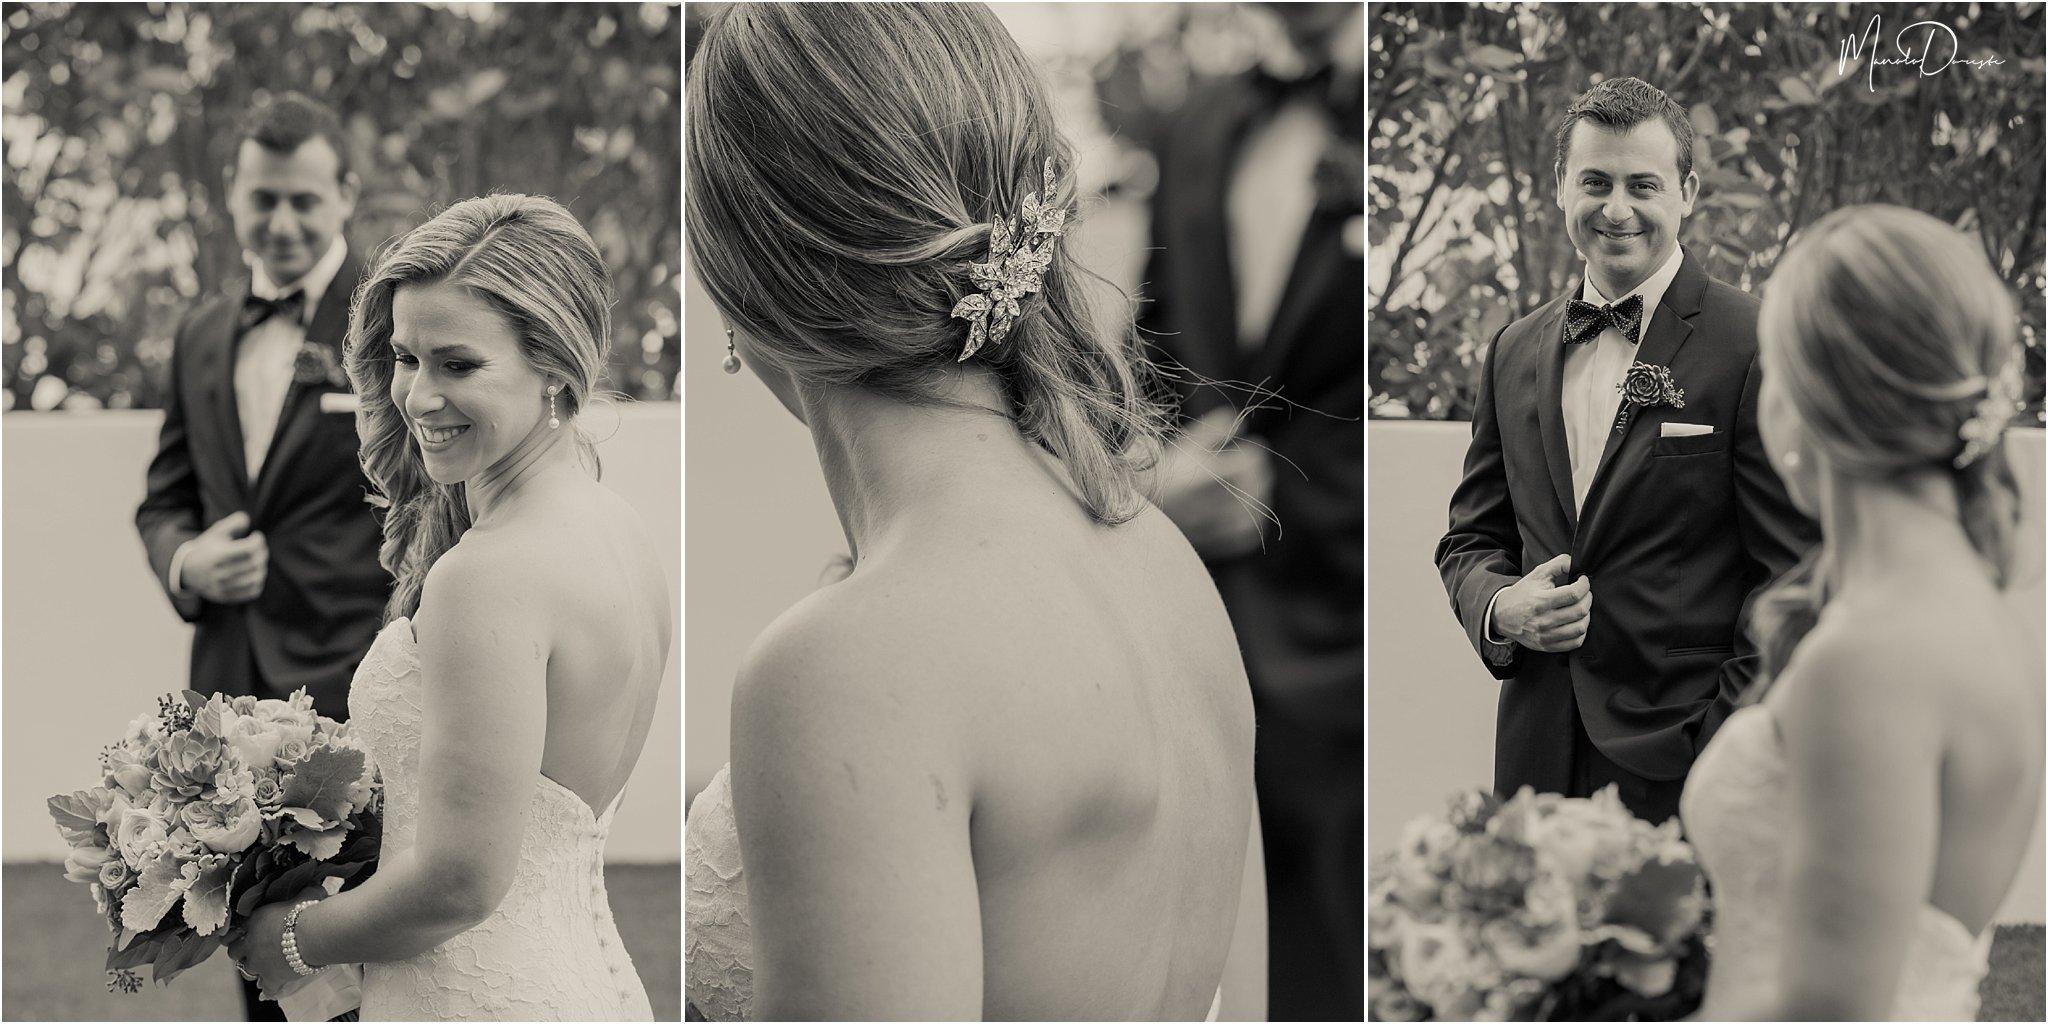 0662_ManoloDoreste_InFocusStudios_Wedding_Family_Photography_Miami_MiamiPhotographer.jpg